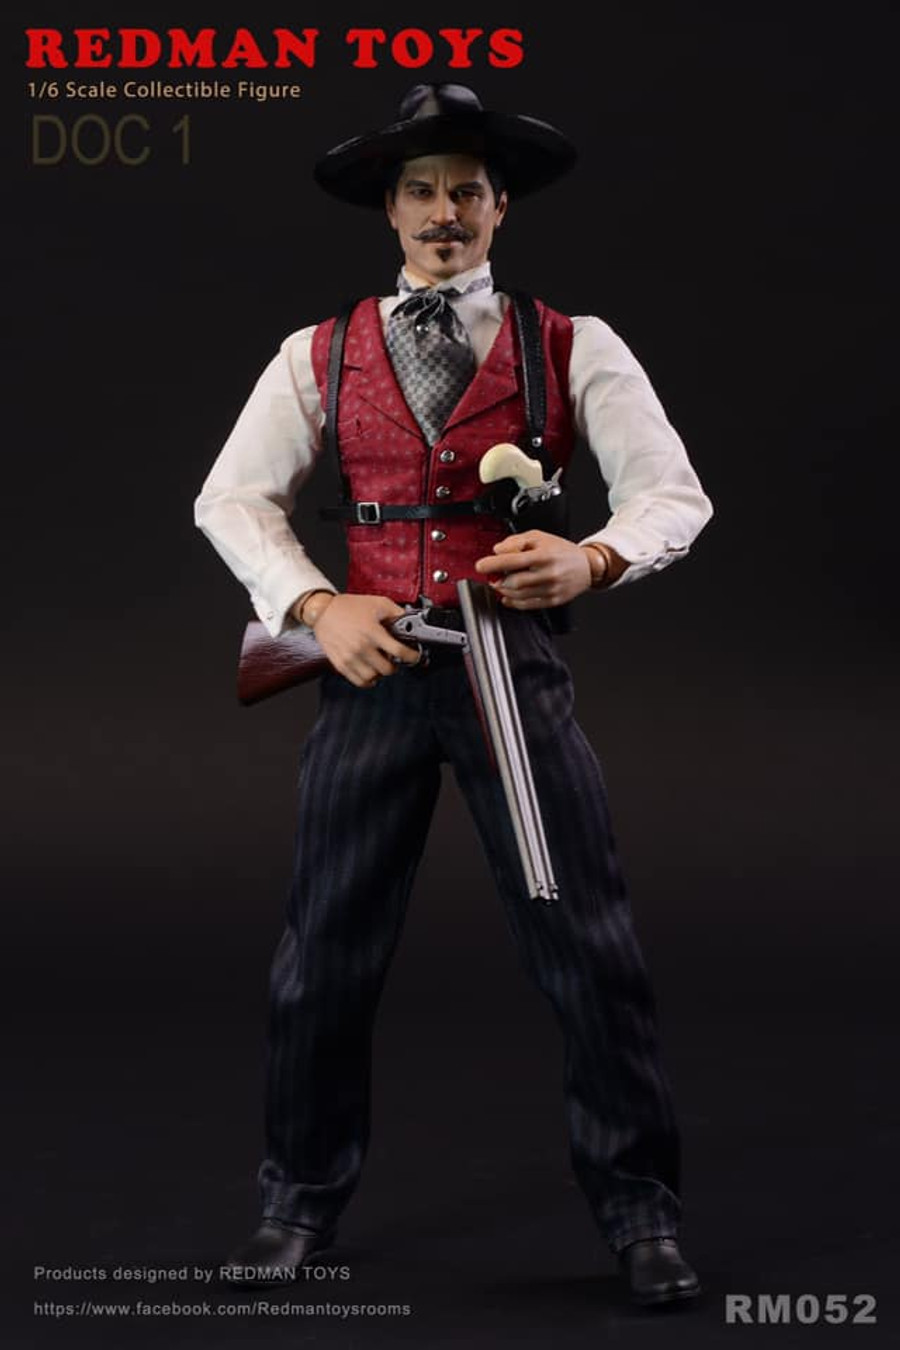 Redman Toys - The Cowboy Doc 1